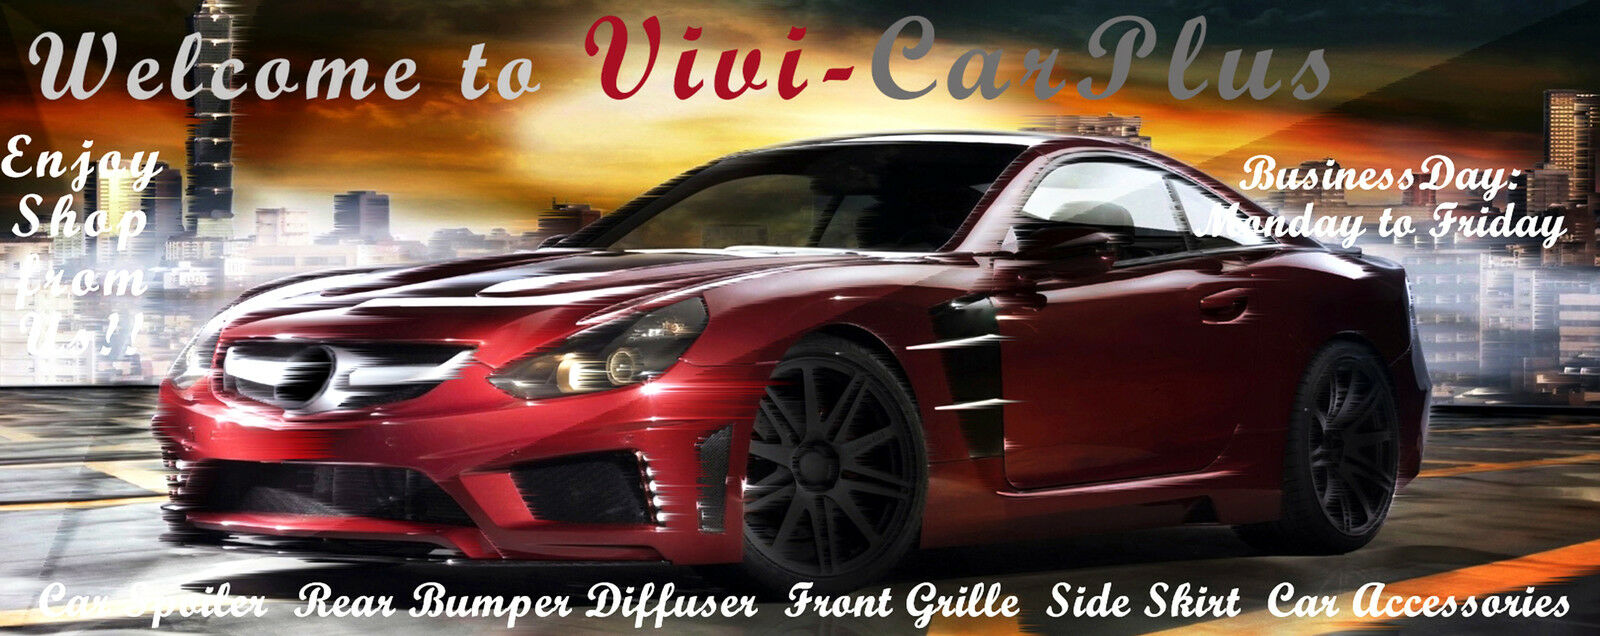 Vivi-CarPlus